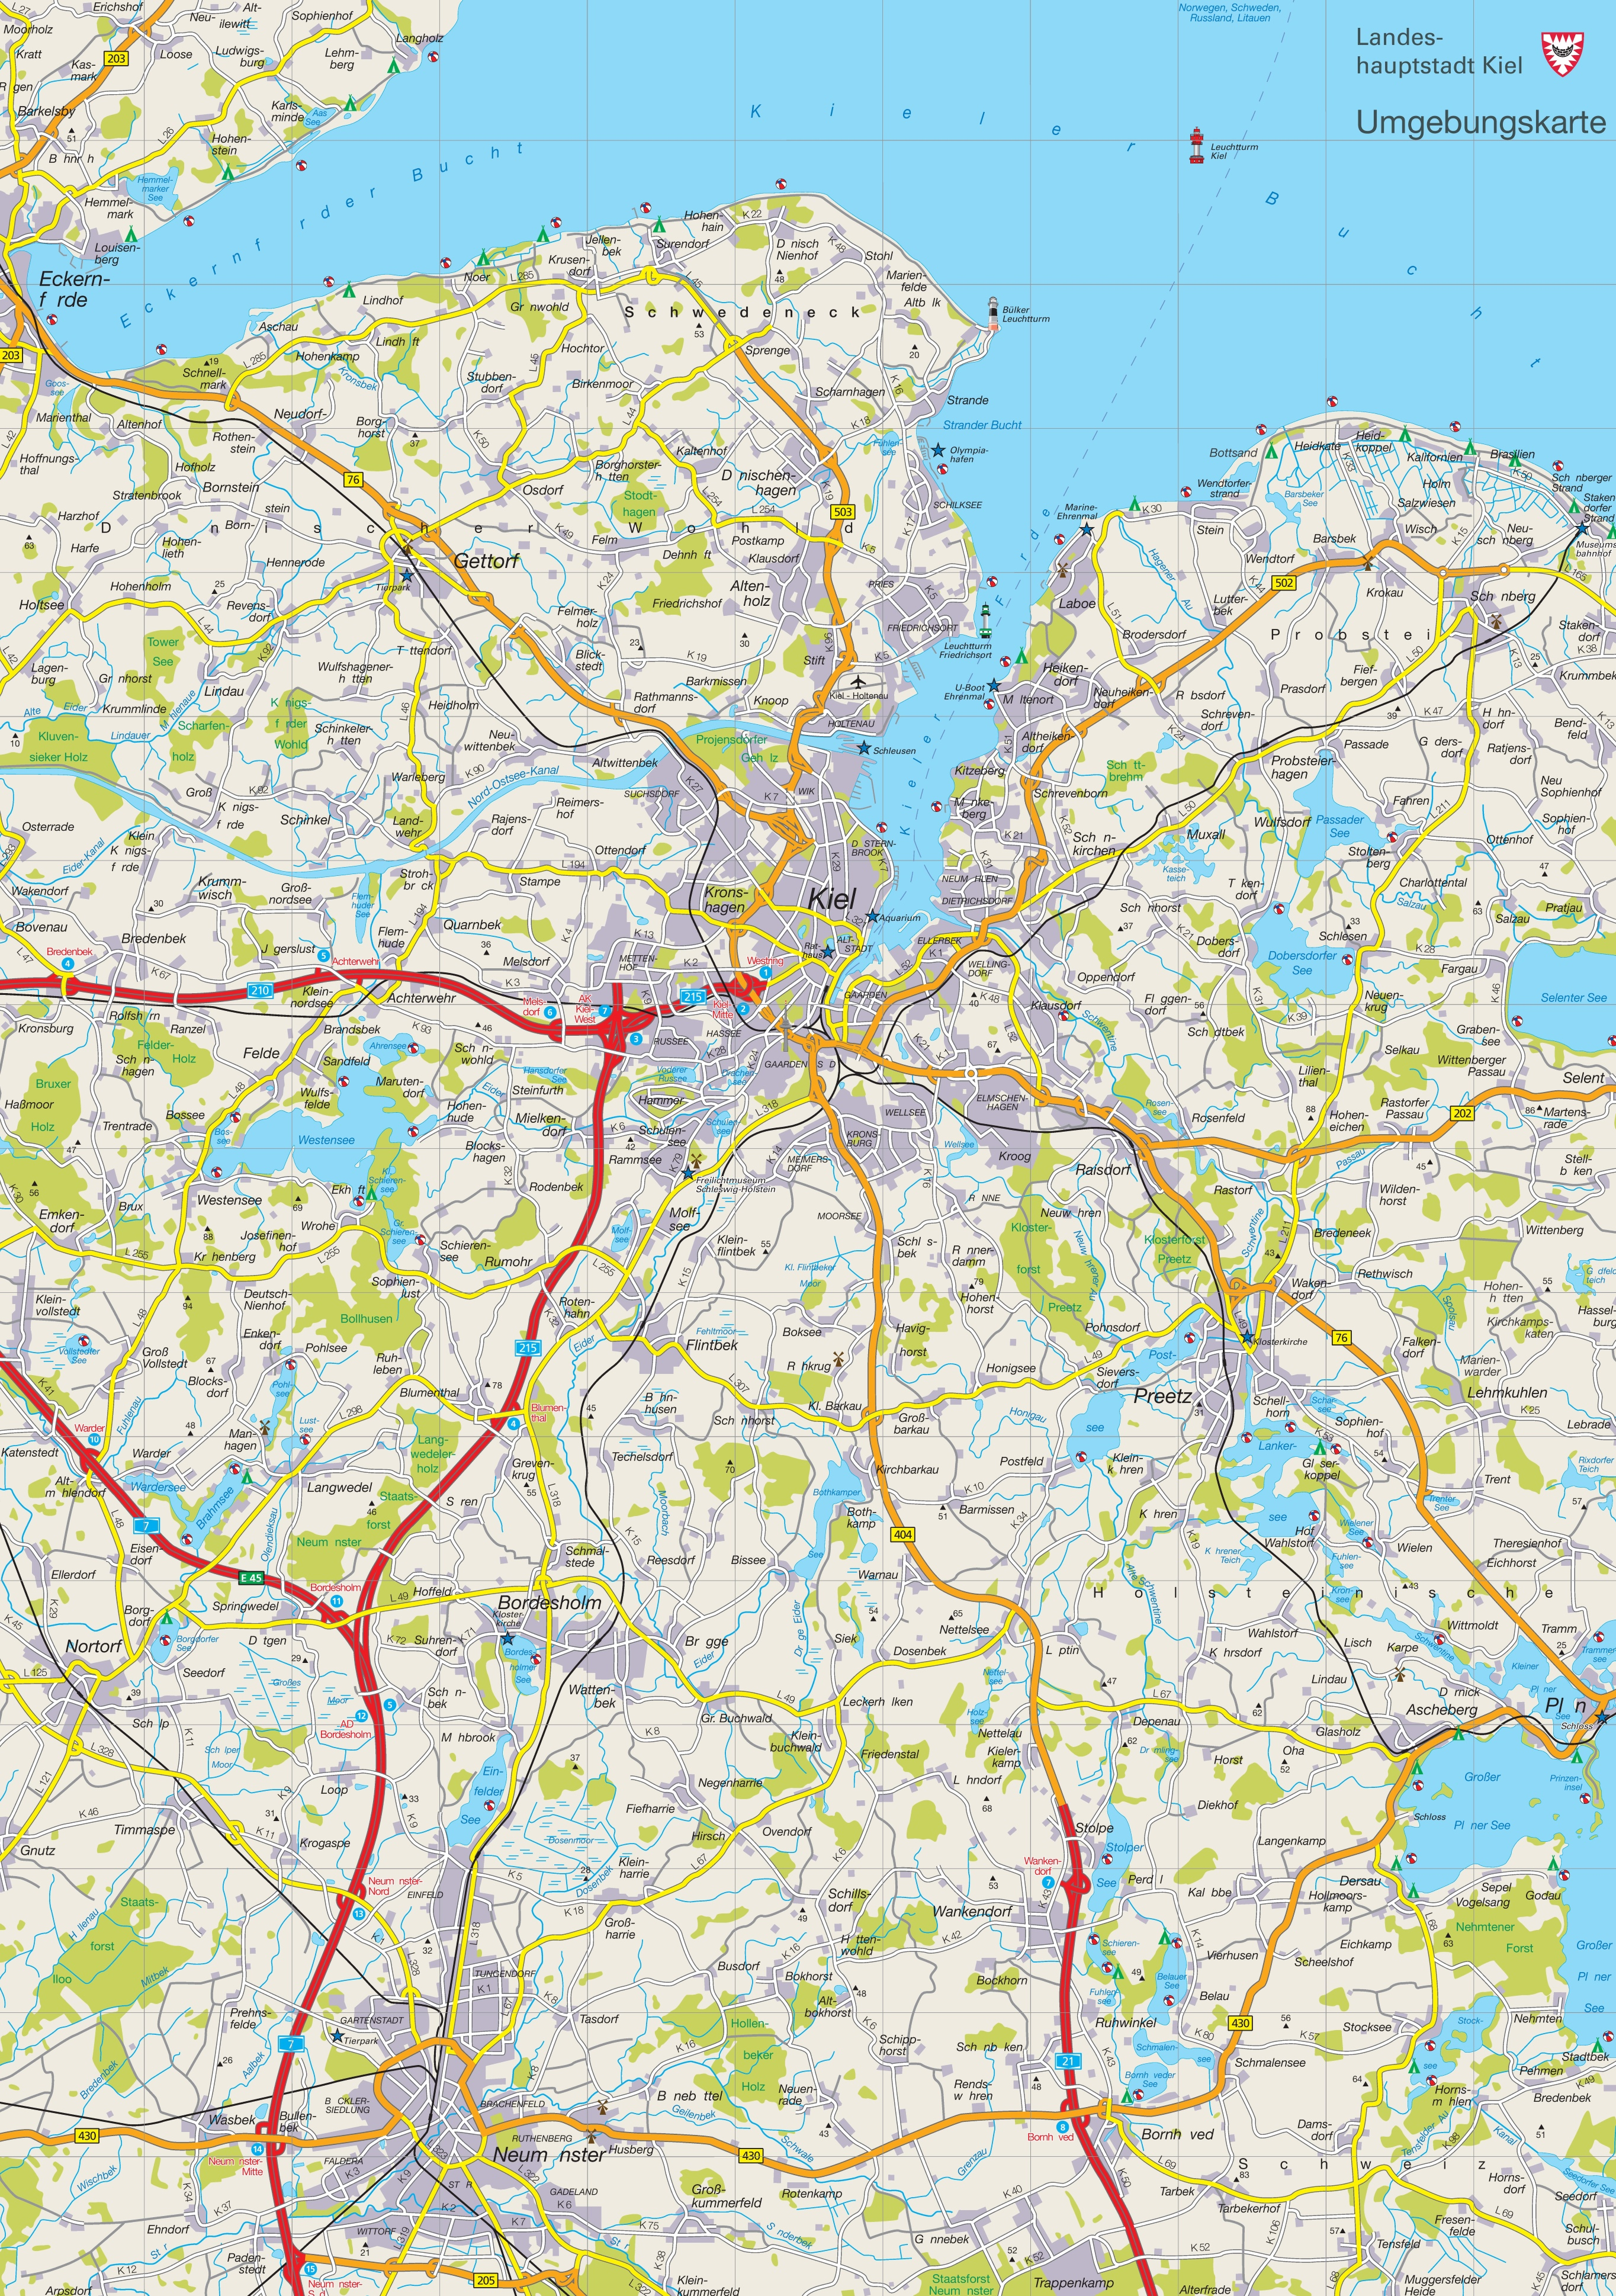 Map of surroundings of Kiel